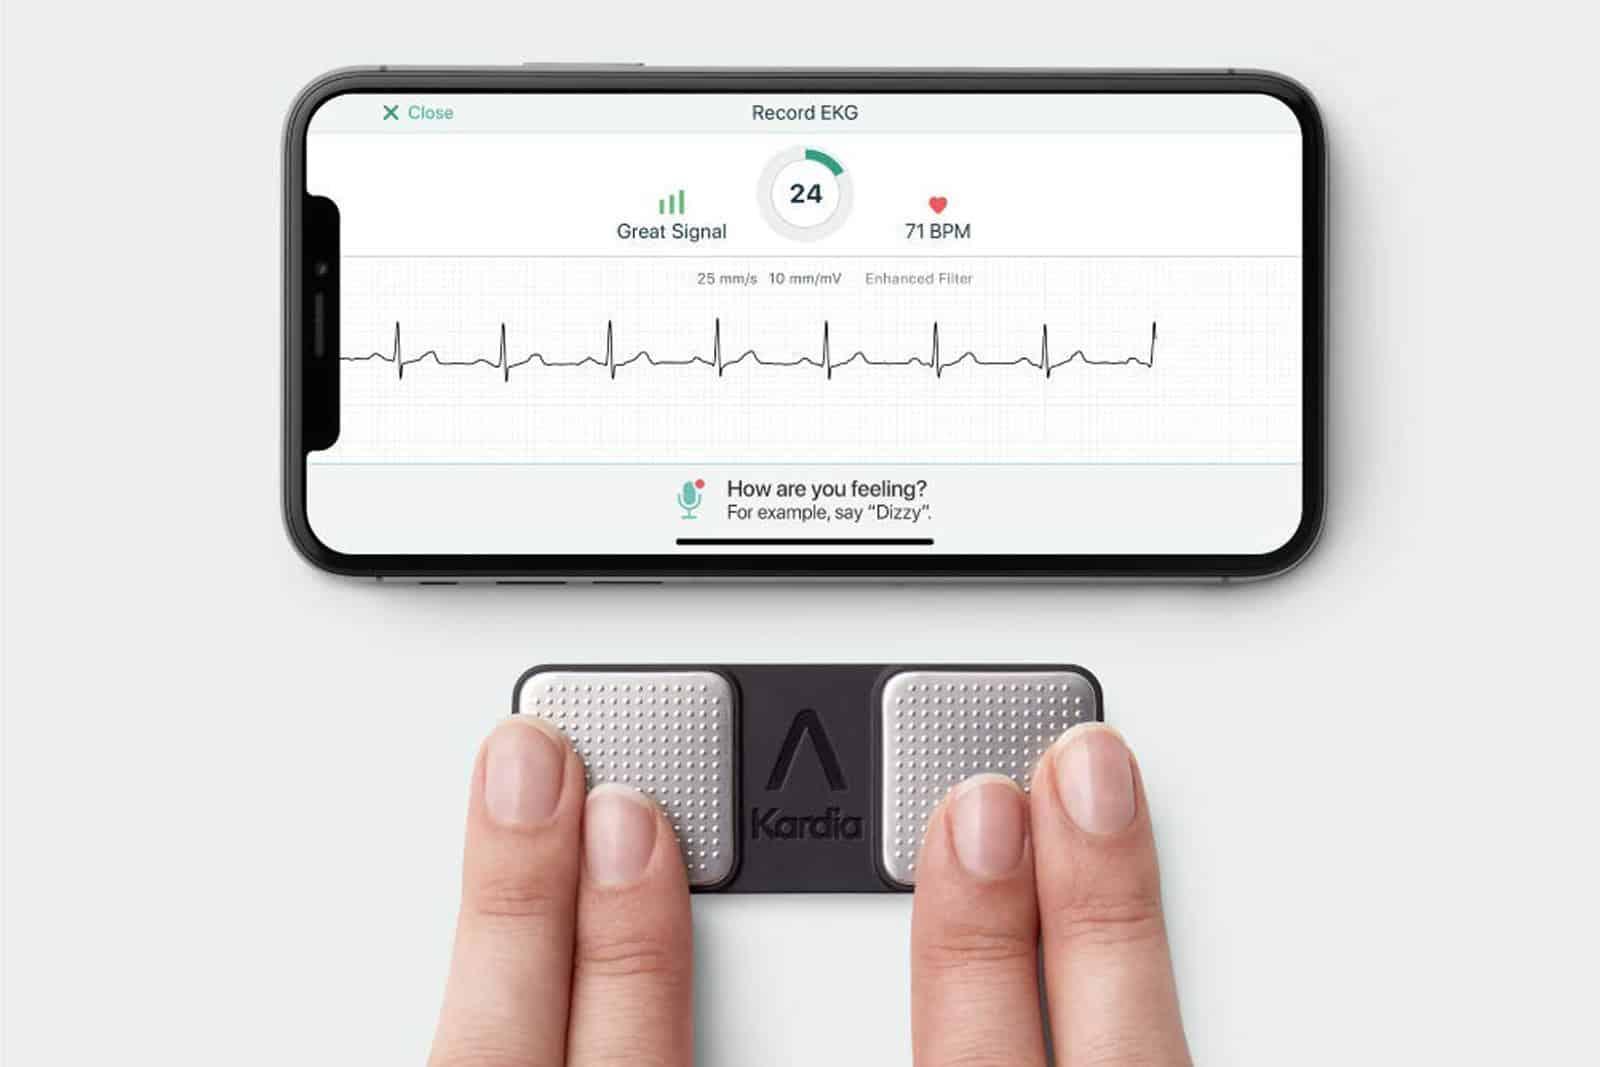 Kardia Personal EKG 5